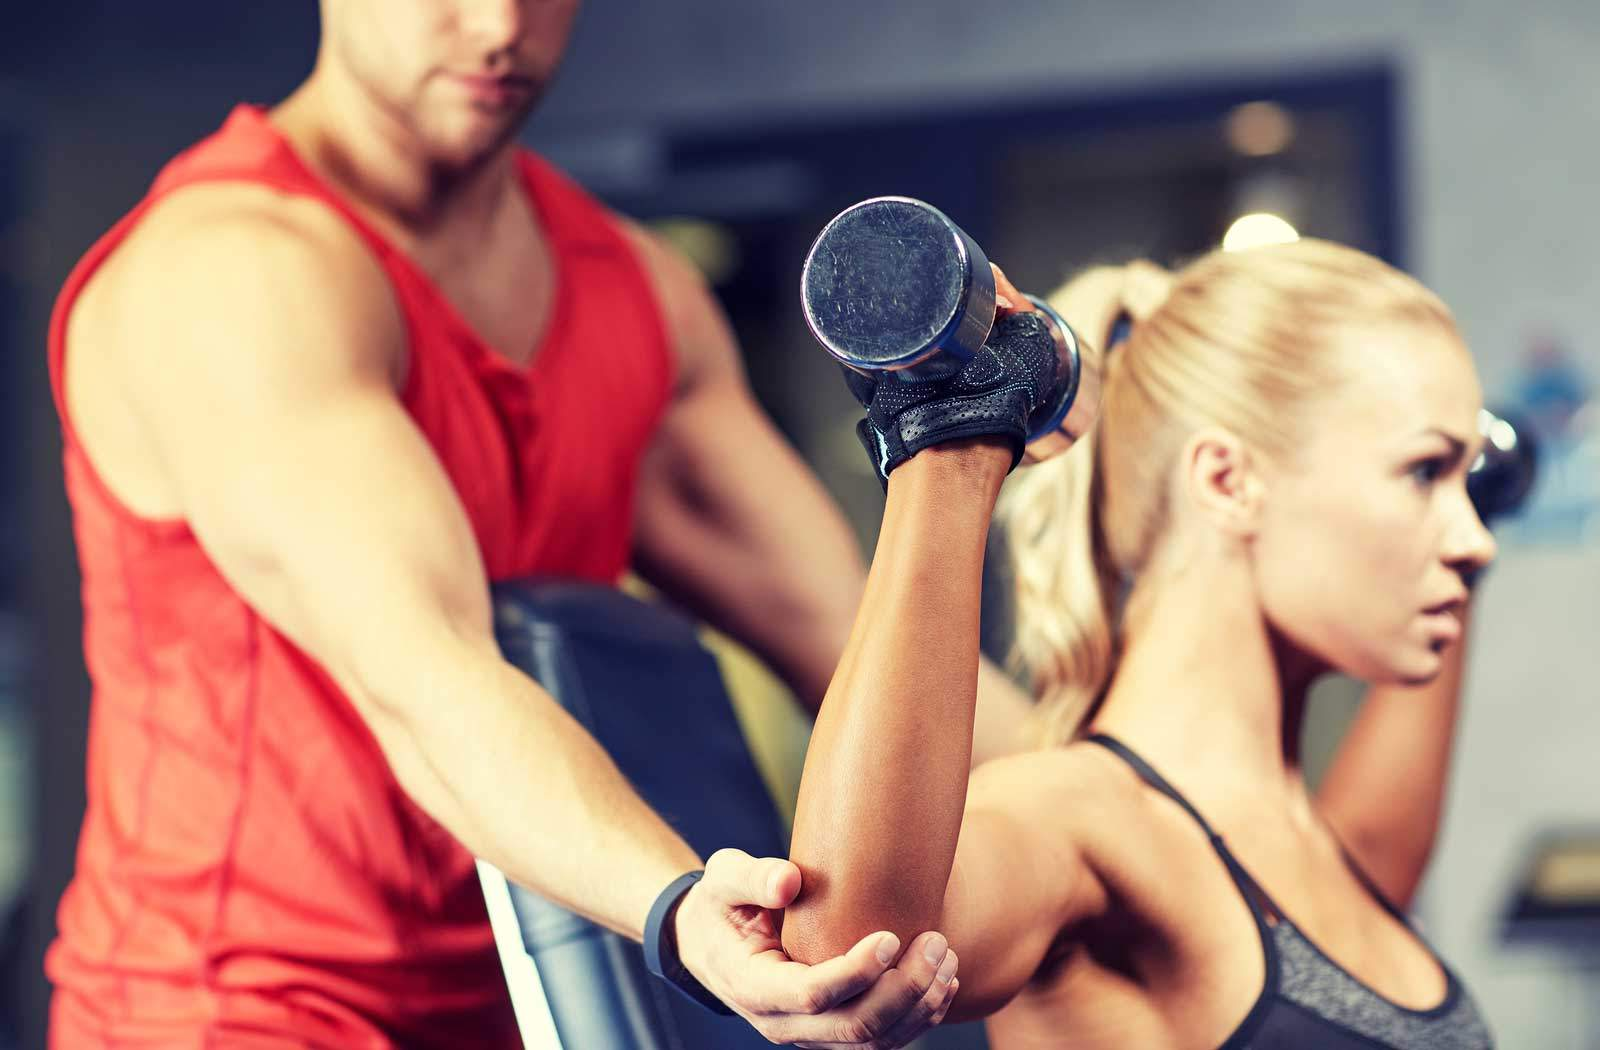 bodybuilding-training-las-vegas